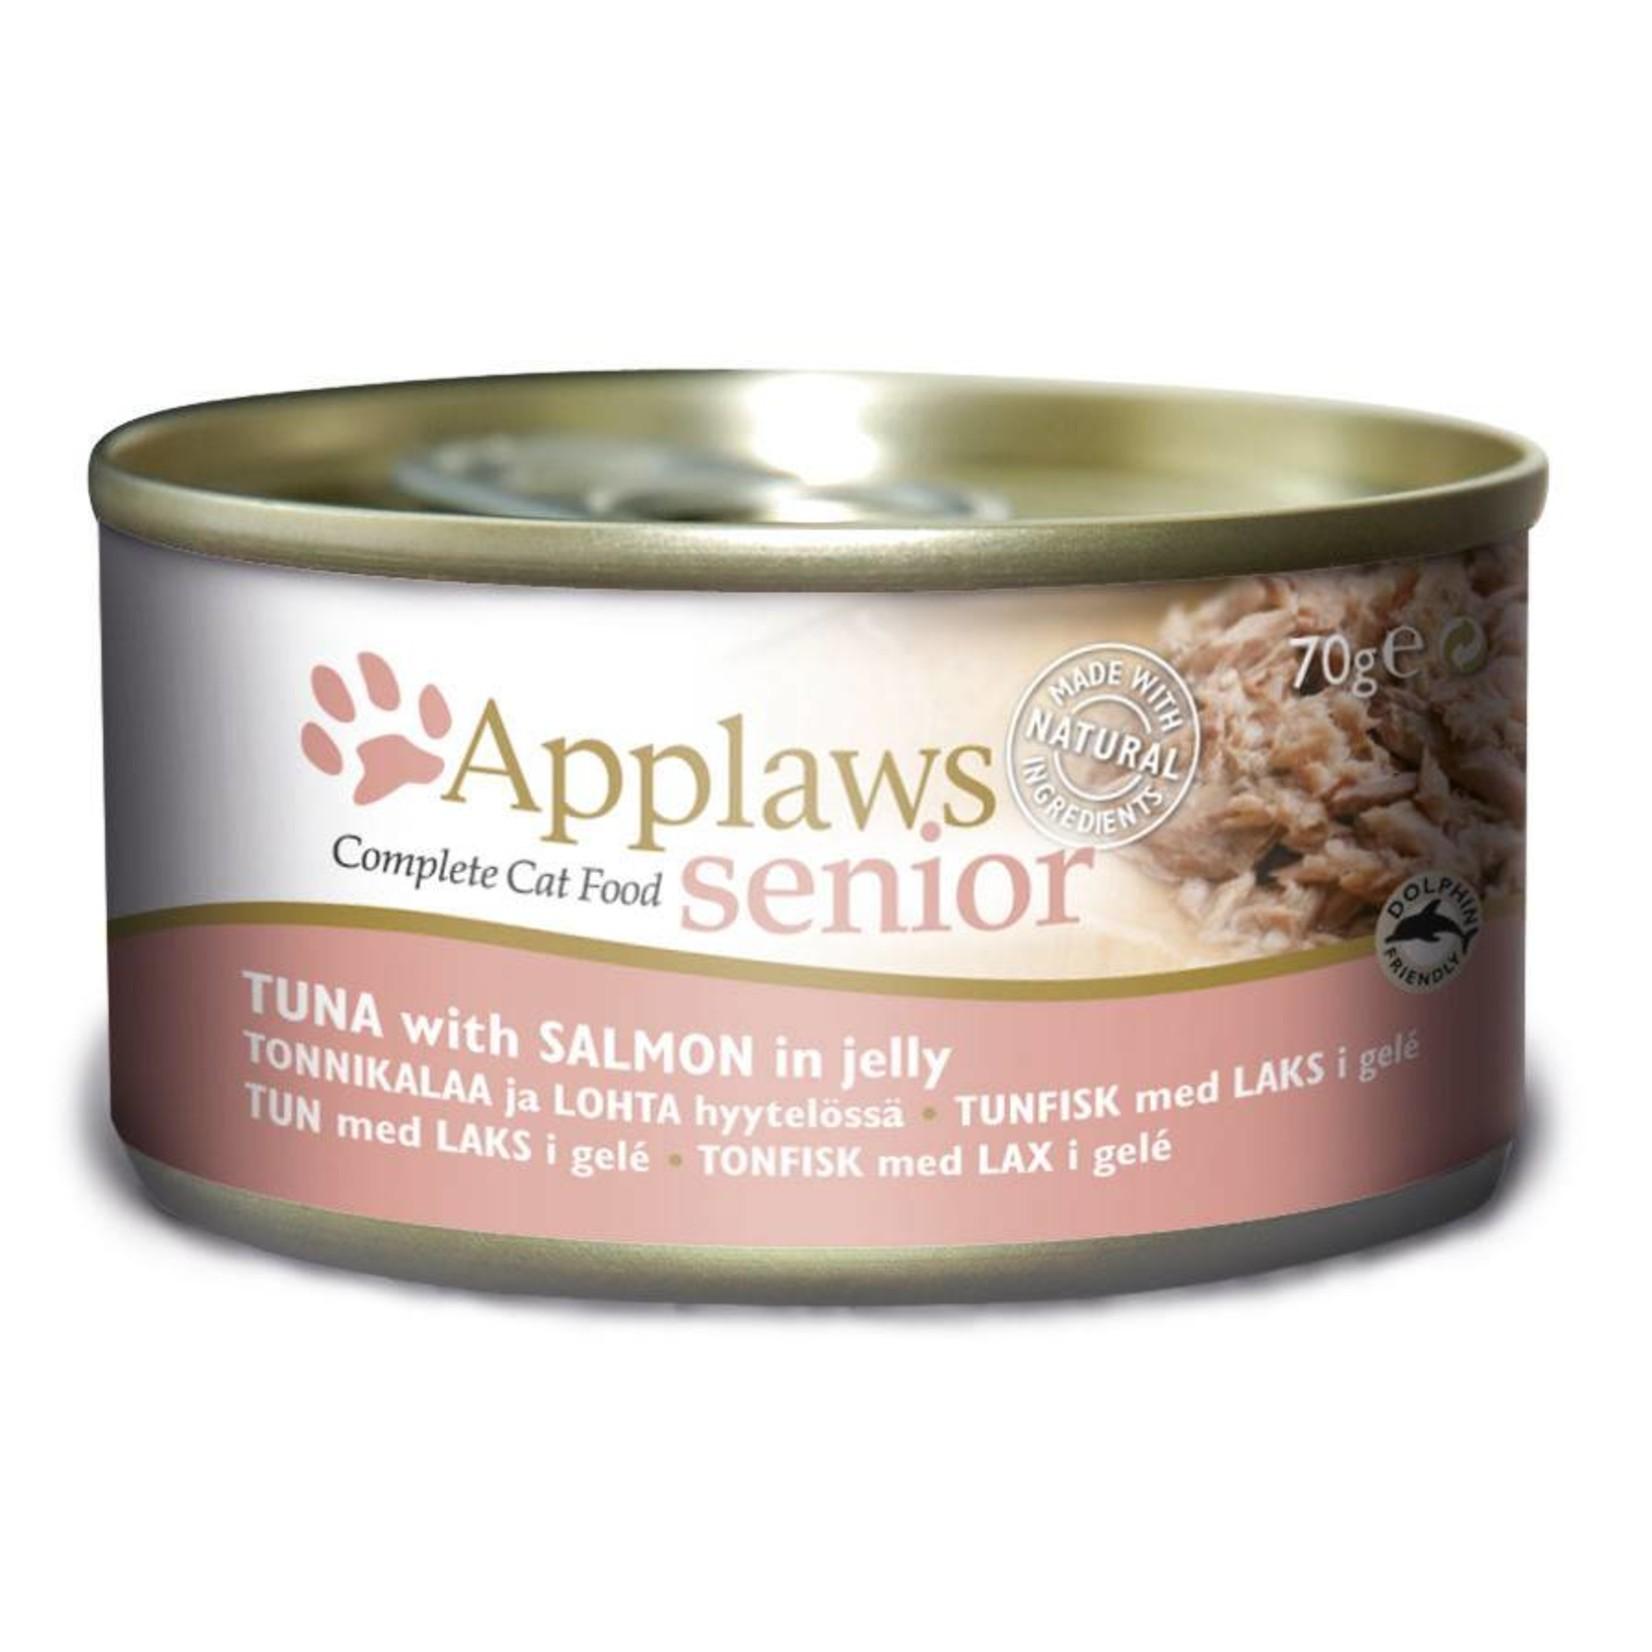 Applaws Cat Wet Food Senior Tuna with Salmon, 70g